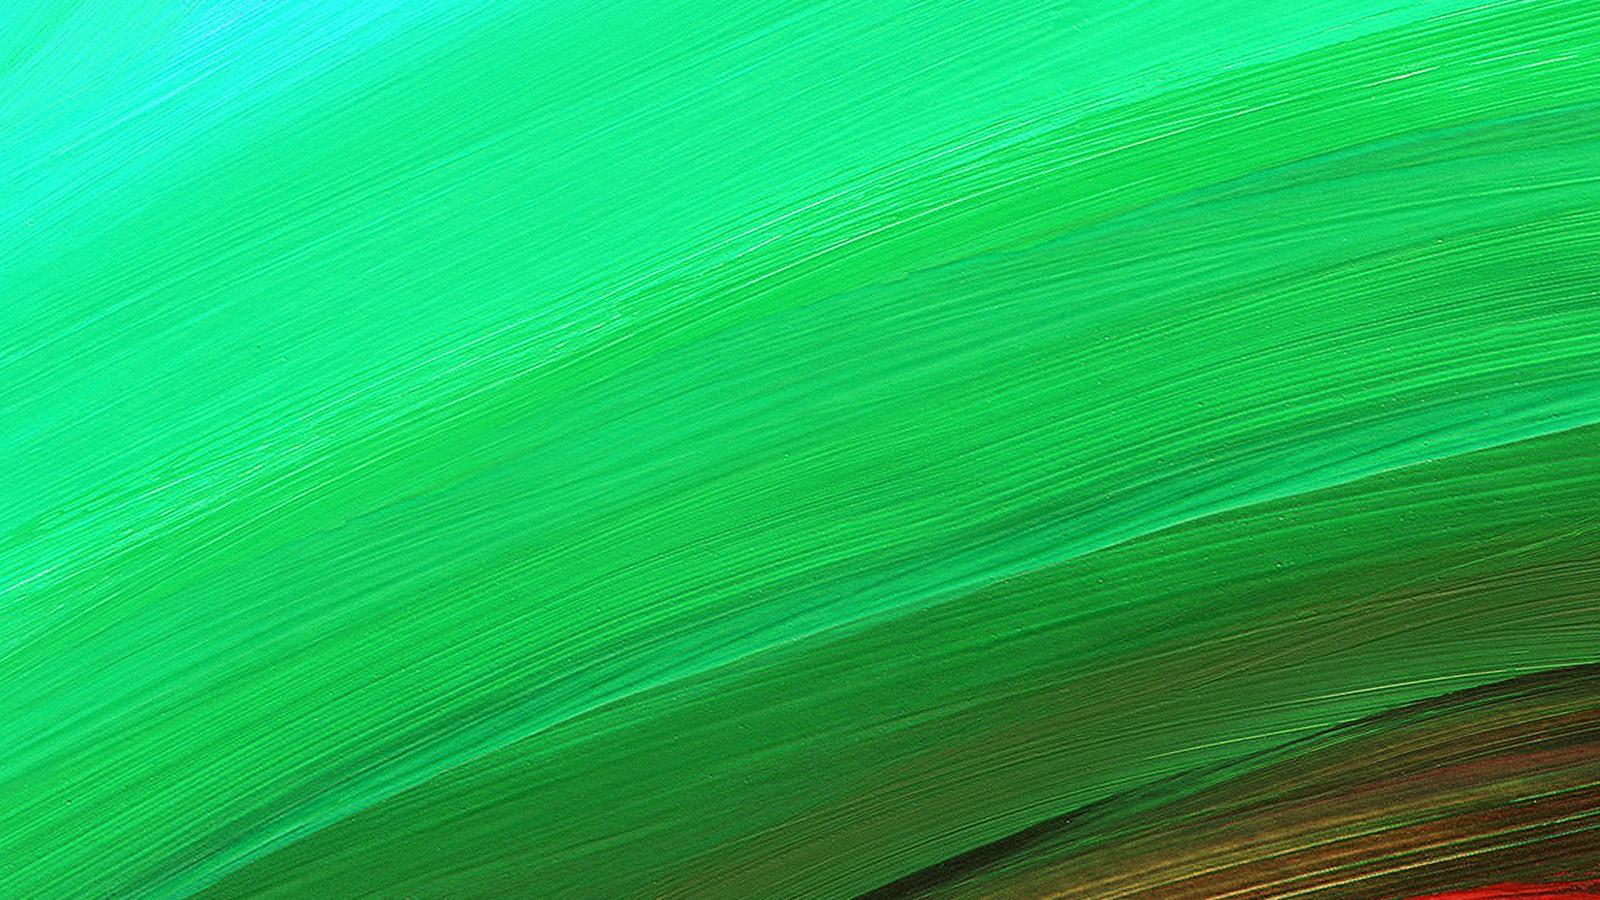 Iphone X Gold Wallpaper Wallpaper For Desktop Laptop Vr45 Rainbow Swirl Line